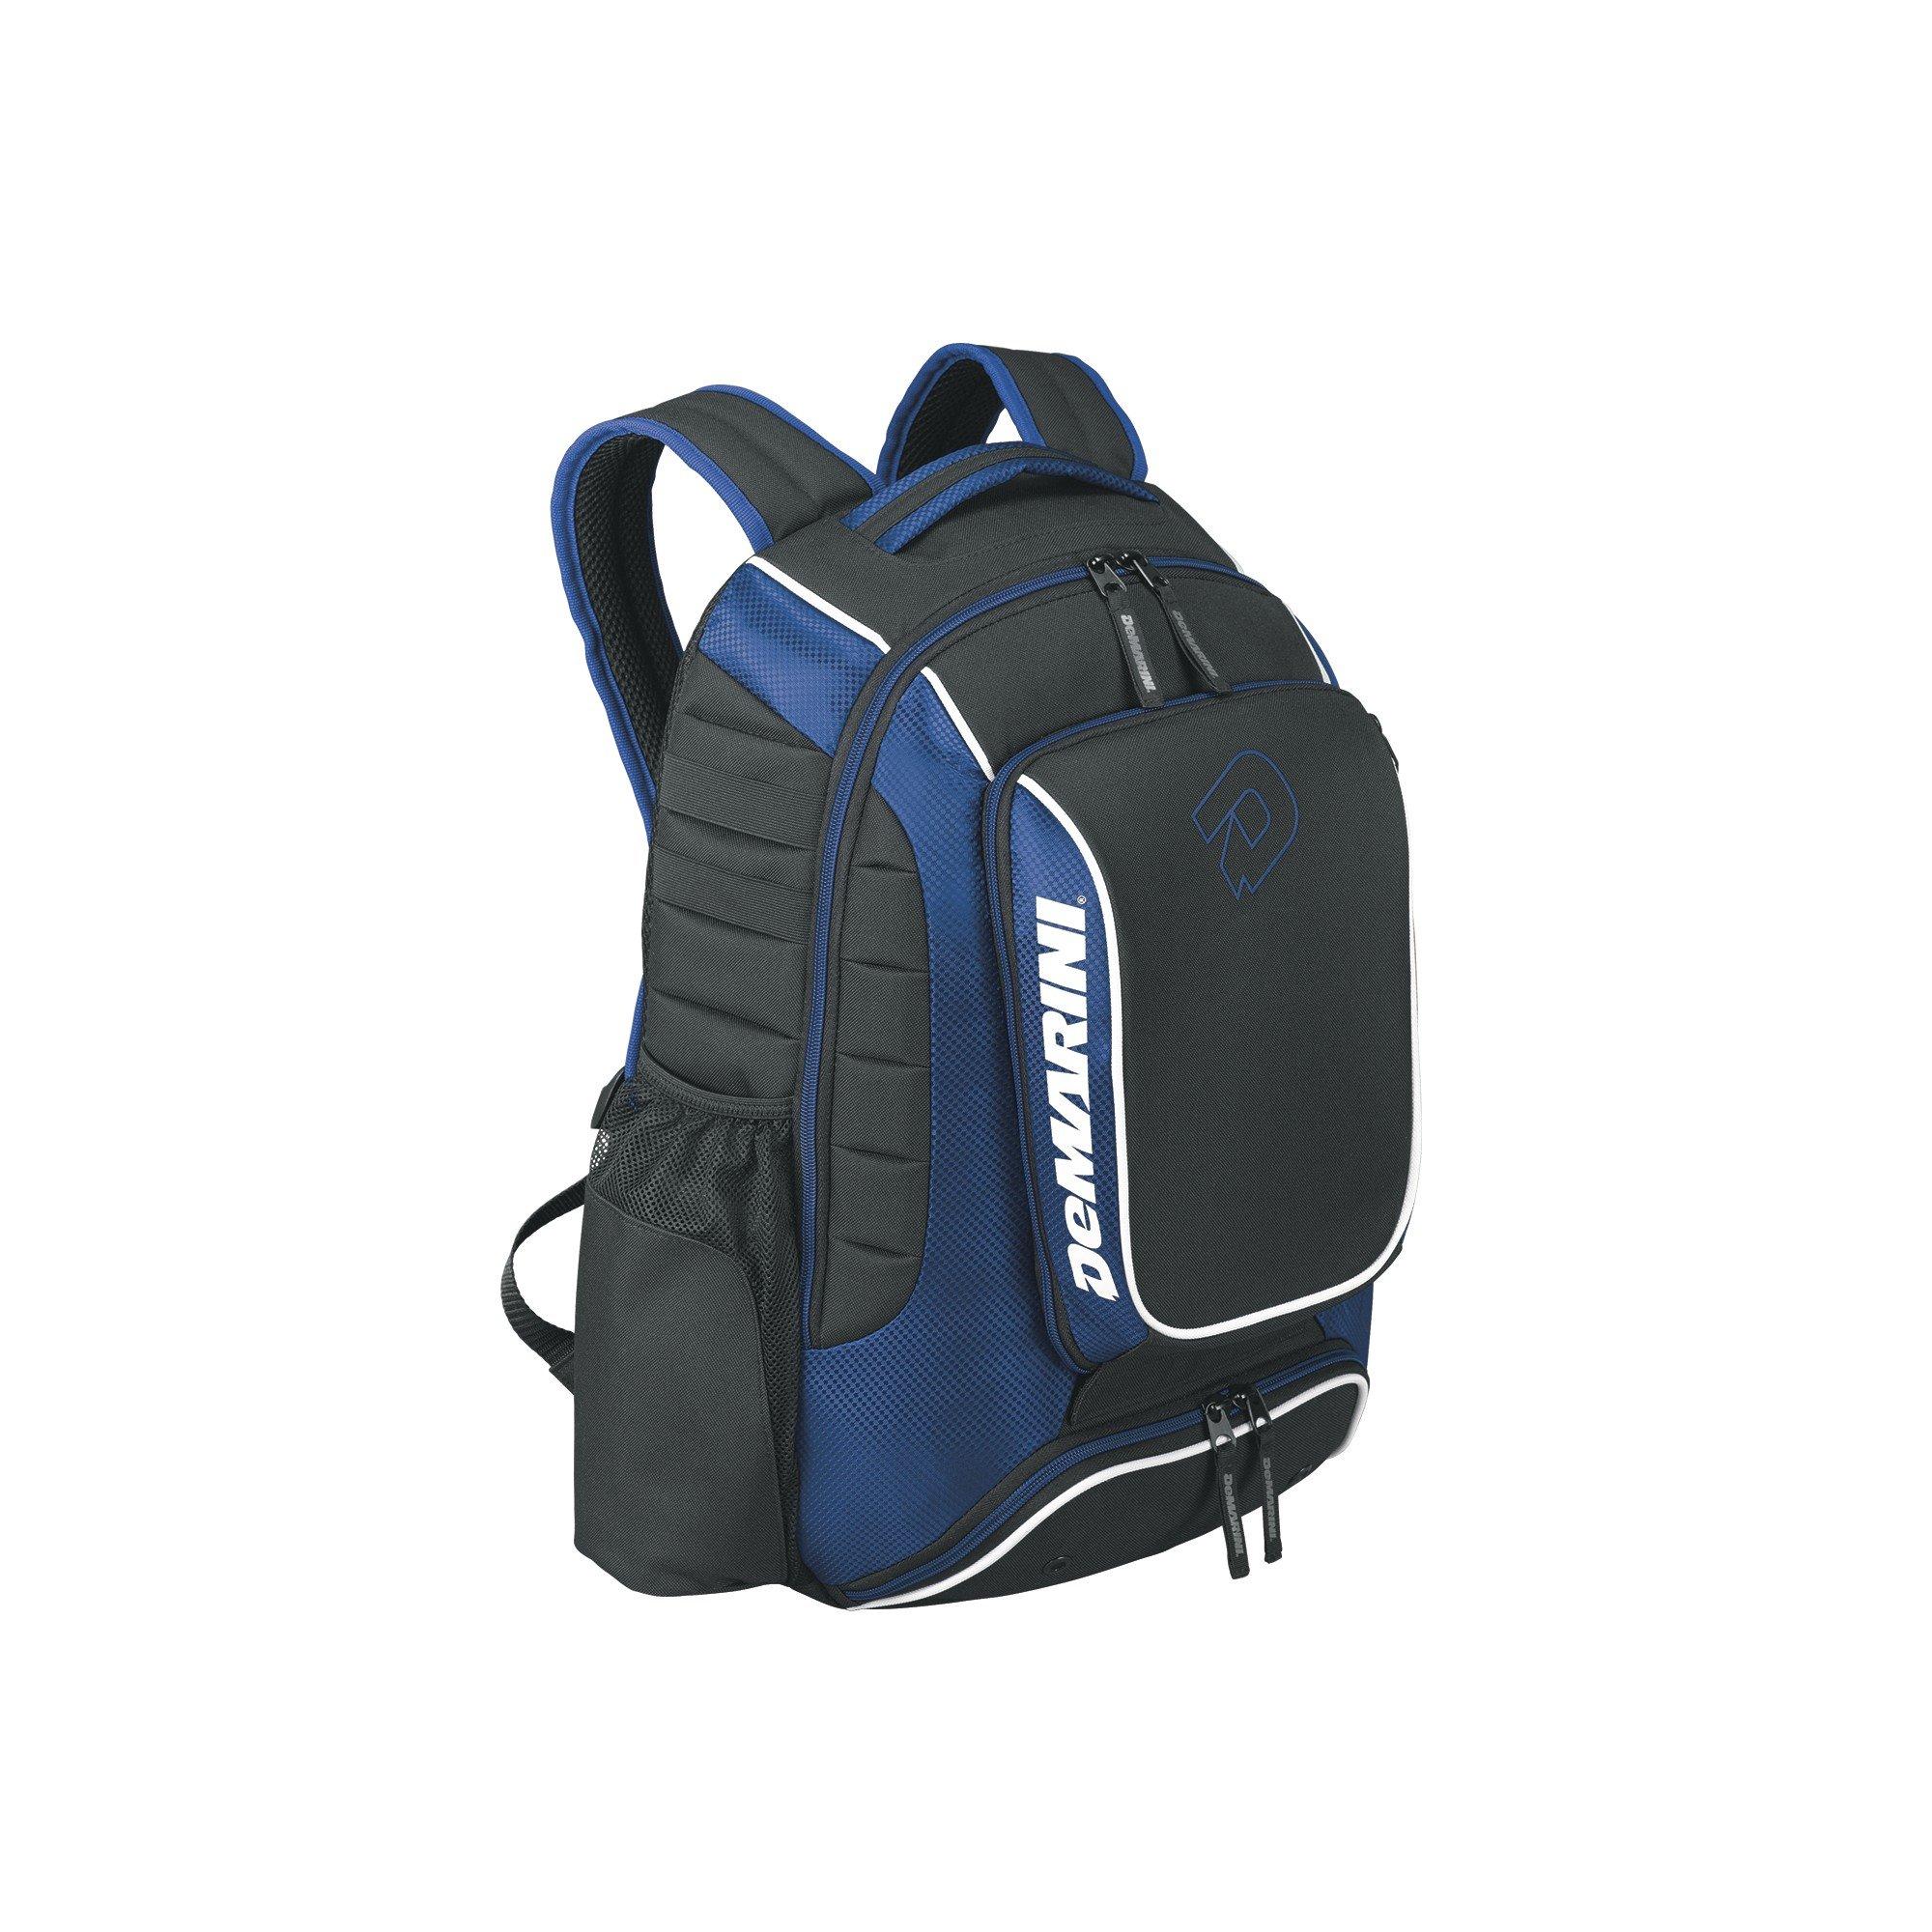 DeMarini Momentum Backpack, Royal by DeMarini (Image #1)